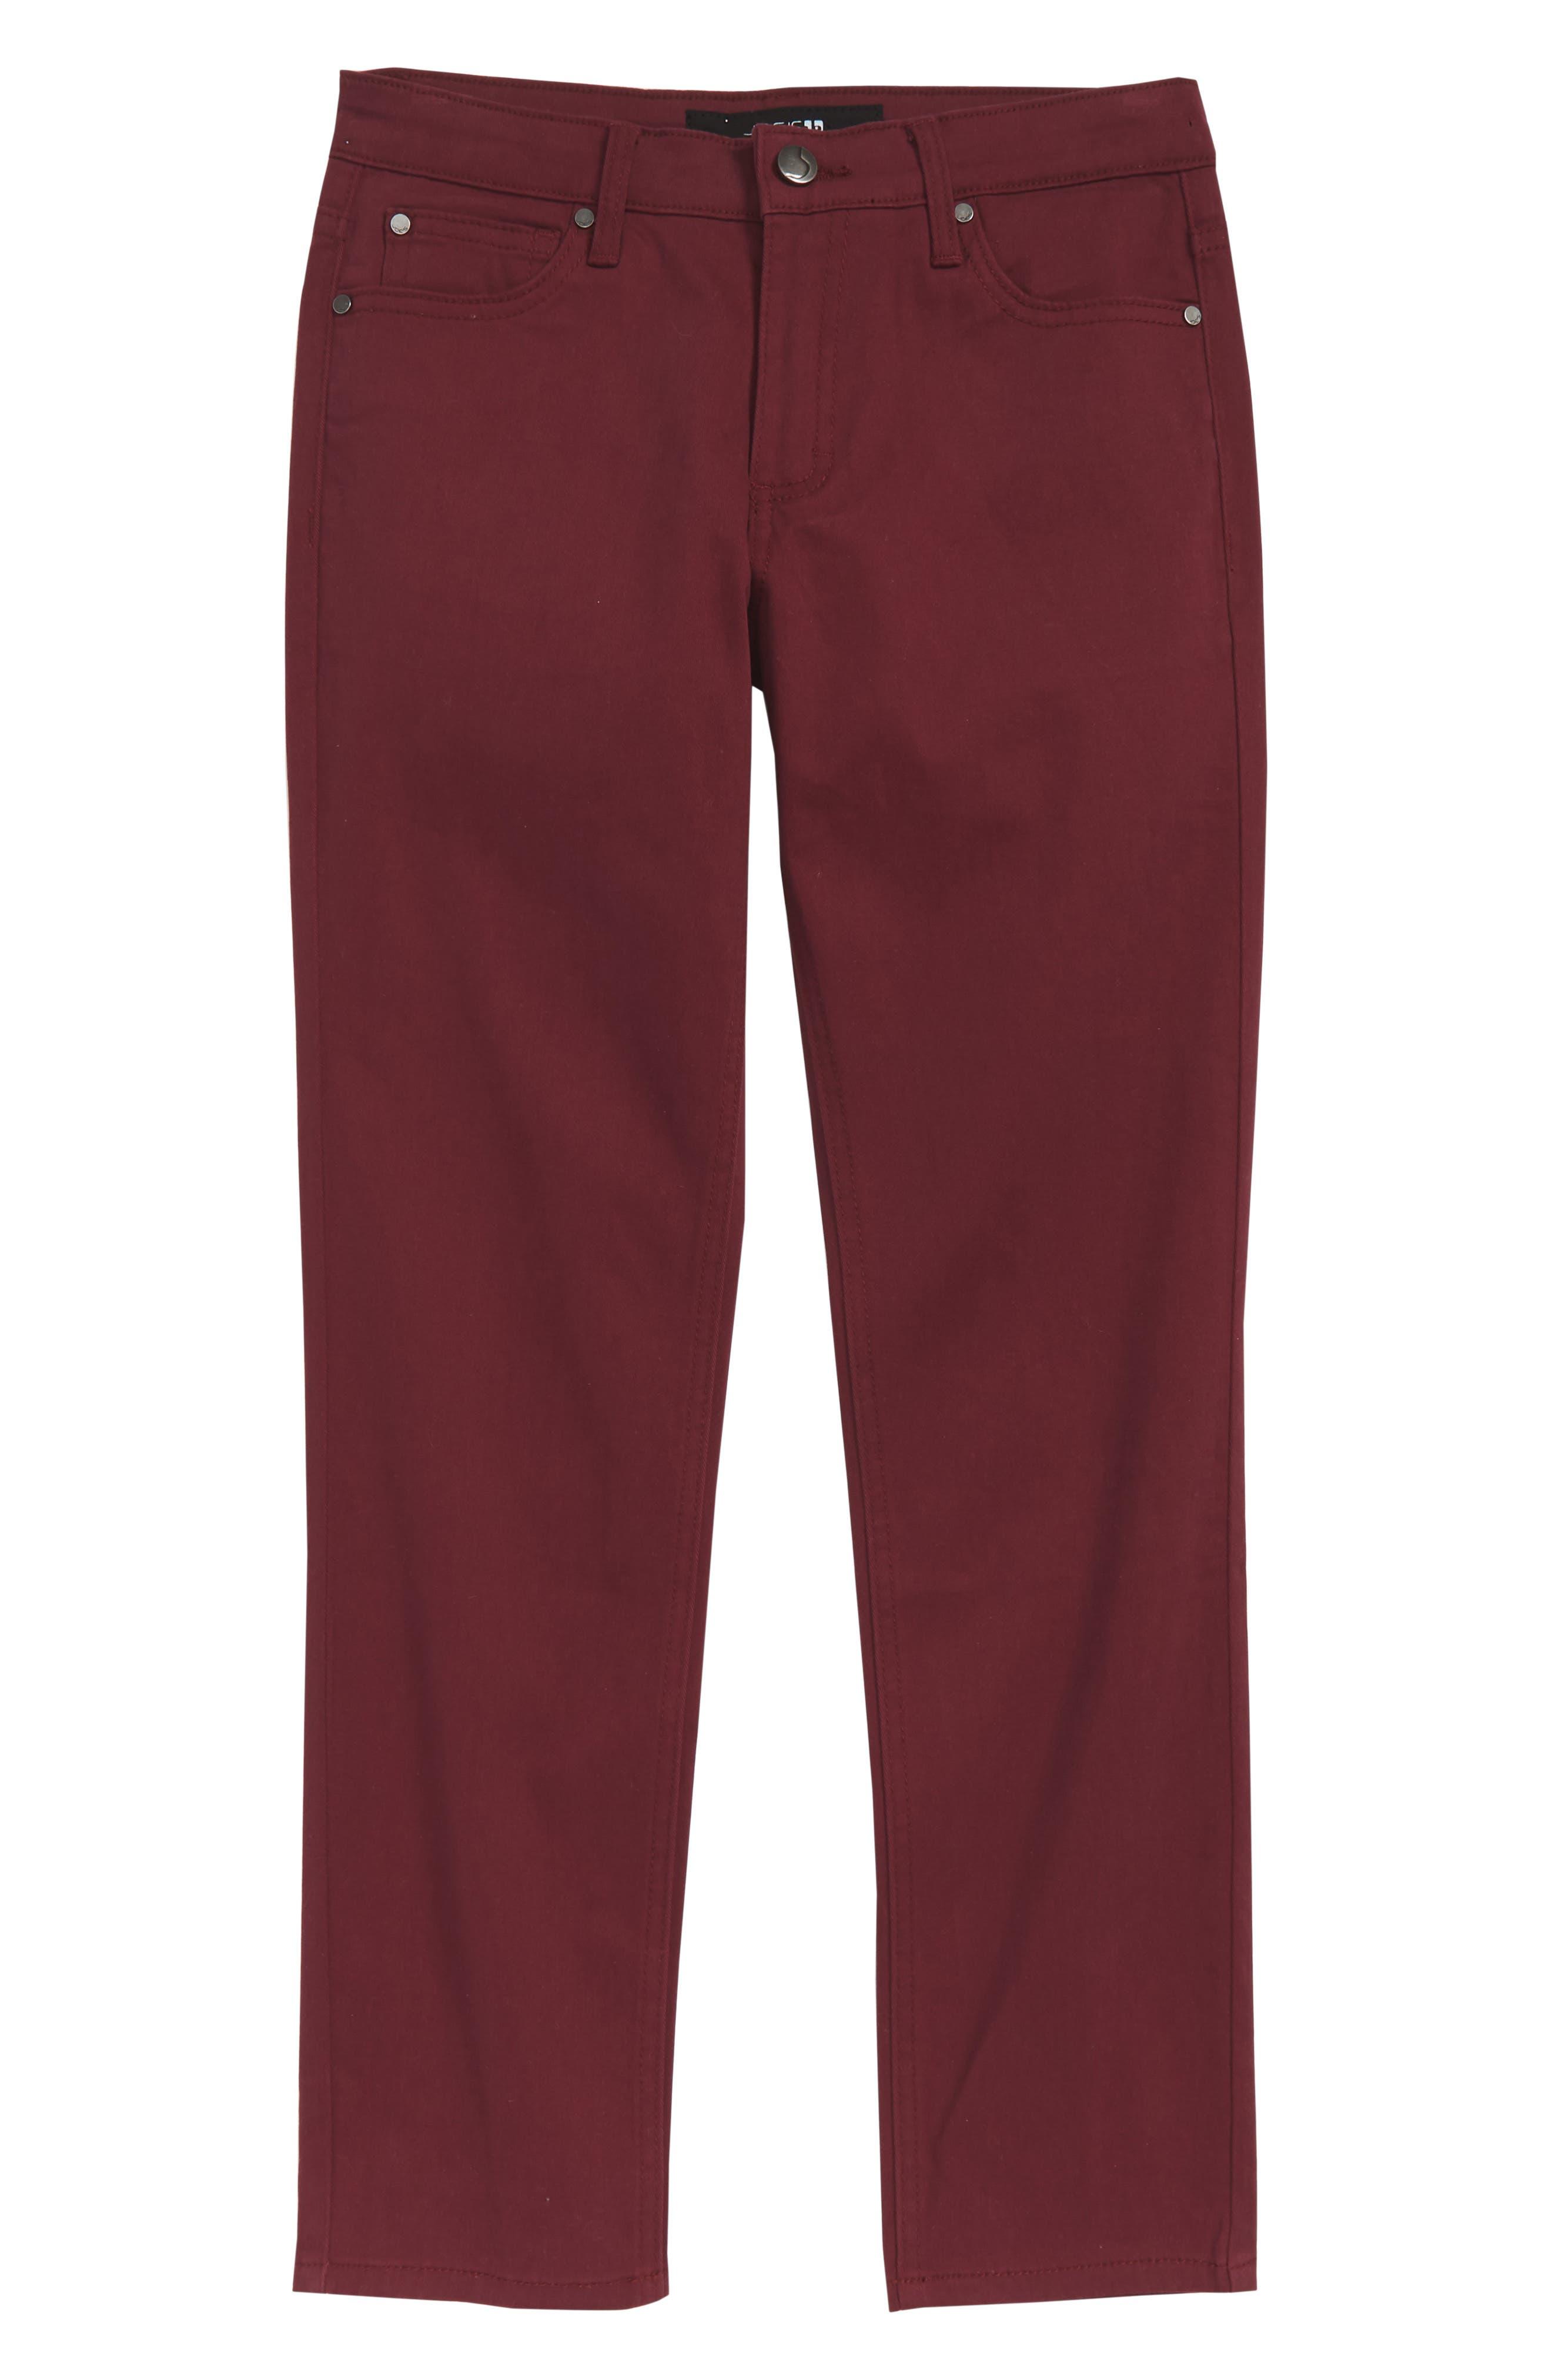 Brixton Straight Leg Stretch Twill Pants,                         Main,                         color, WINE